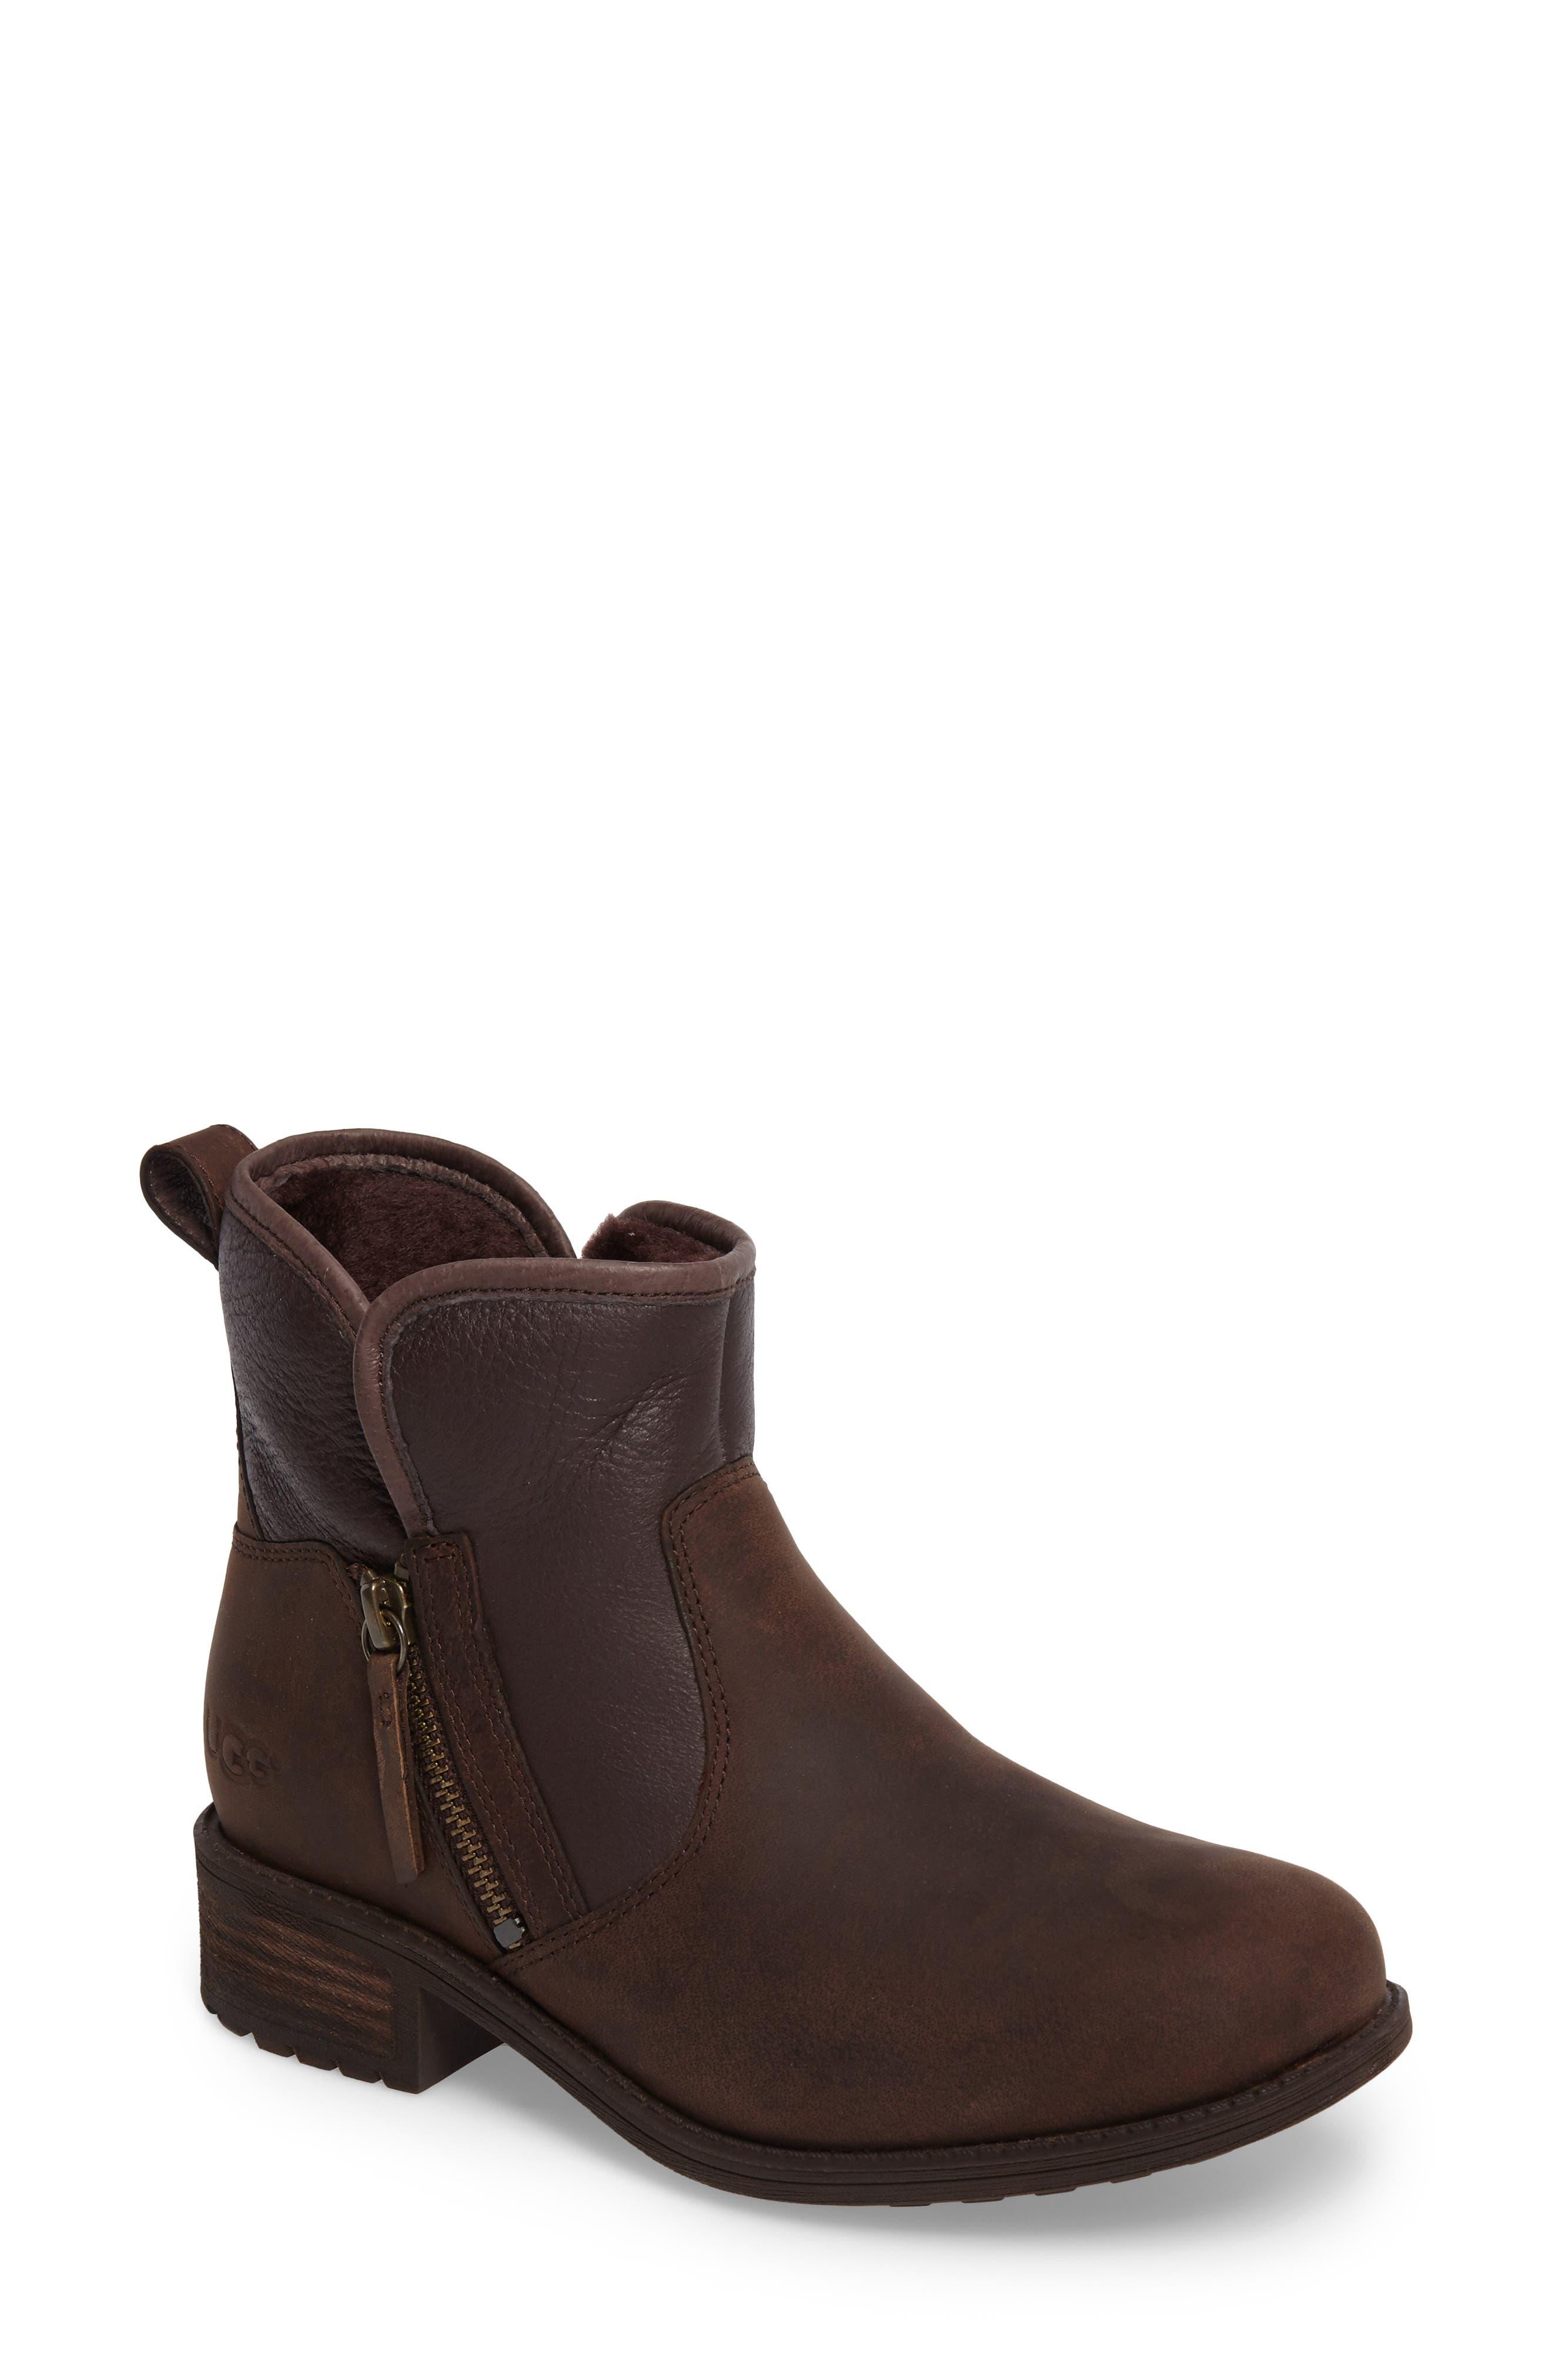 Alternate Image 1 Selected - UGG® Lavelle Boot (Women)